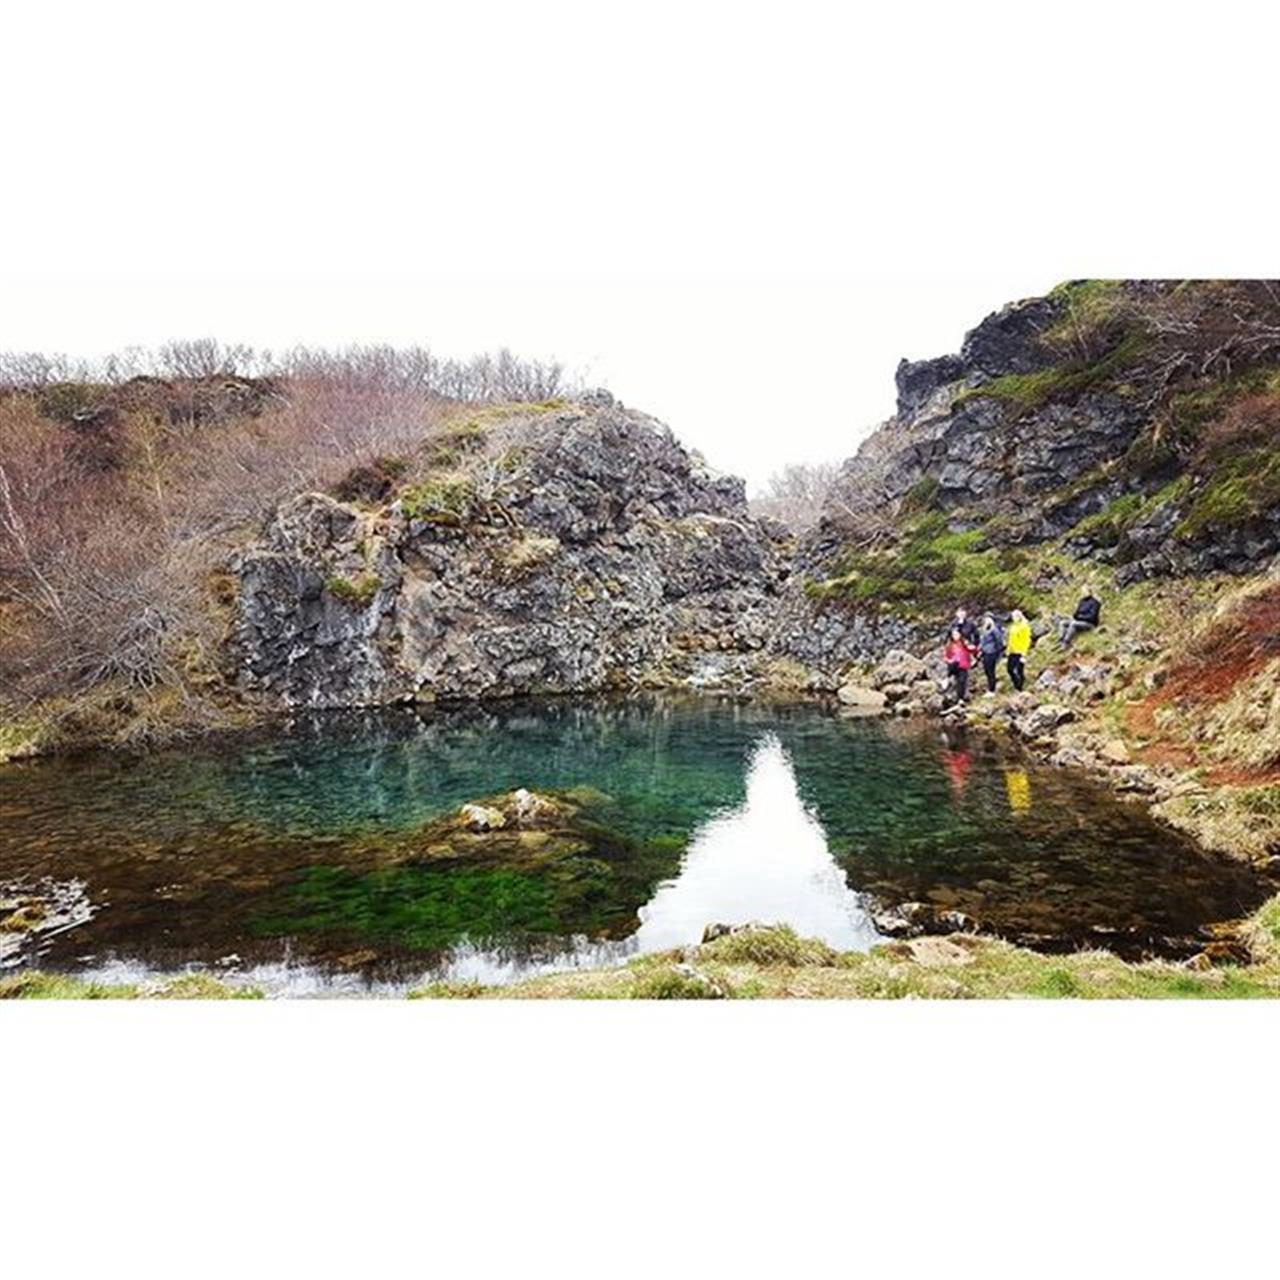 Skelltum okkur Ý g÷ngufer Ý ParadÝsarlaut Ý ßrshßtÝ H·saskj¾ls. Went for a walk to Paradisarlaut during Husaskjol annual springfestival. #paradisarlaut #nature #nattura #walk #ganga #vatn #water #iceland #kyrrd #ro# luxury #leadingrelocal #leadingre